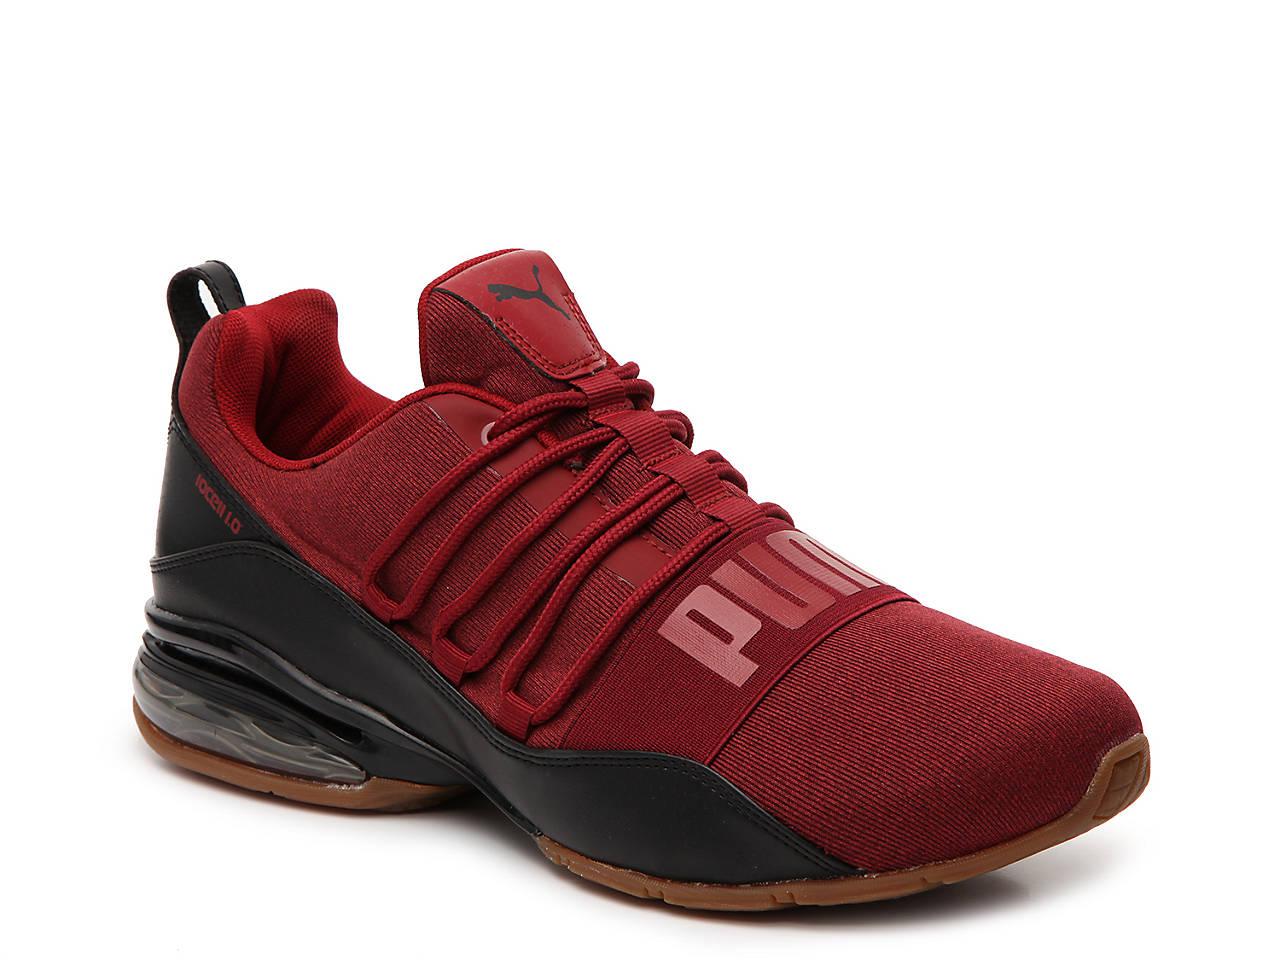 Men's Puma Cell Regulate Nature Tech Running Sneakers cheap amazing price IiQvE